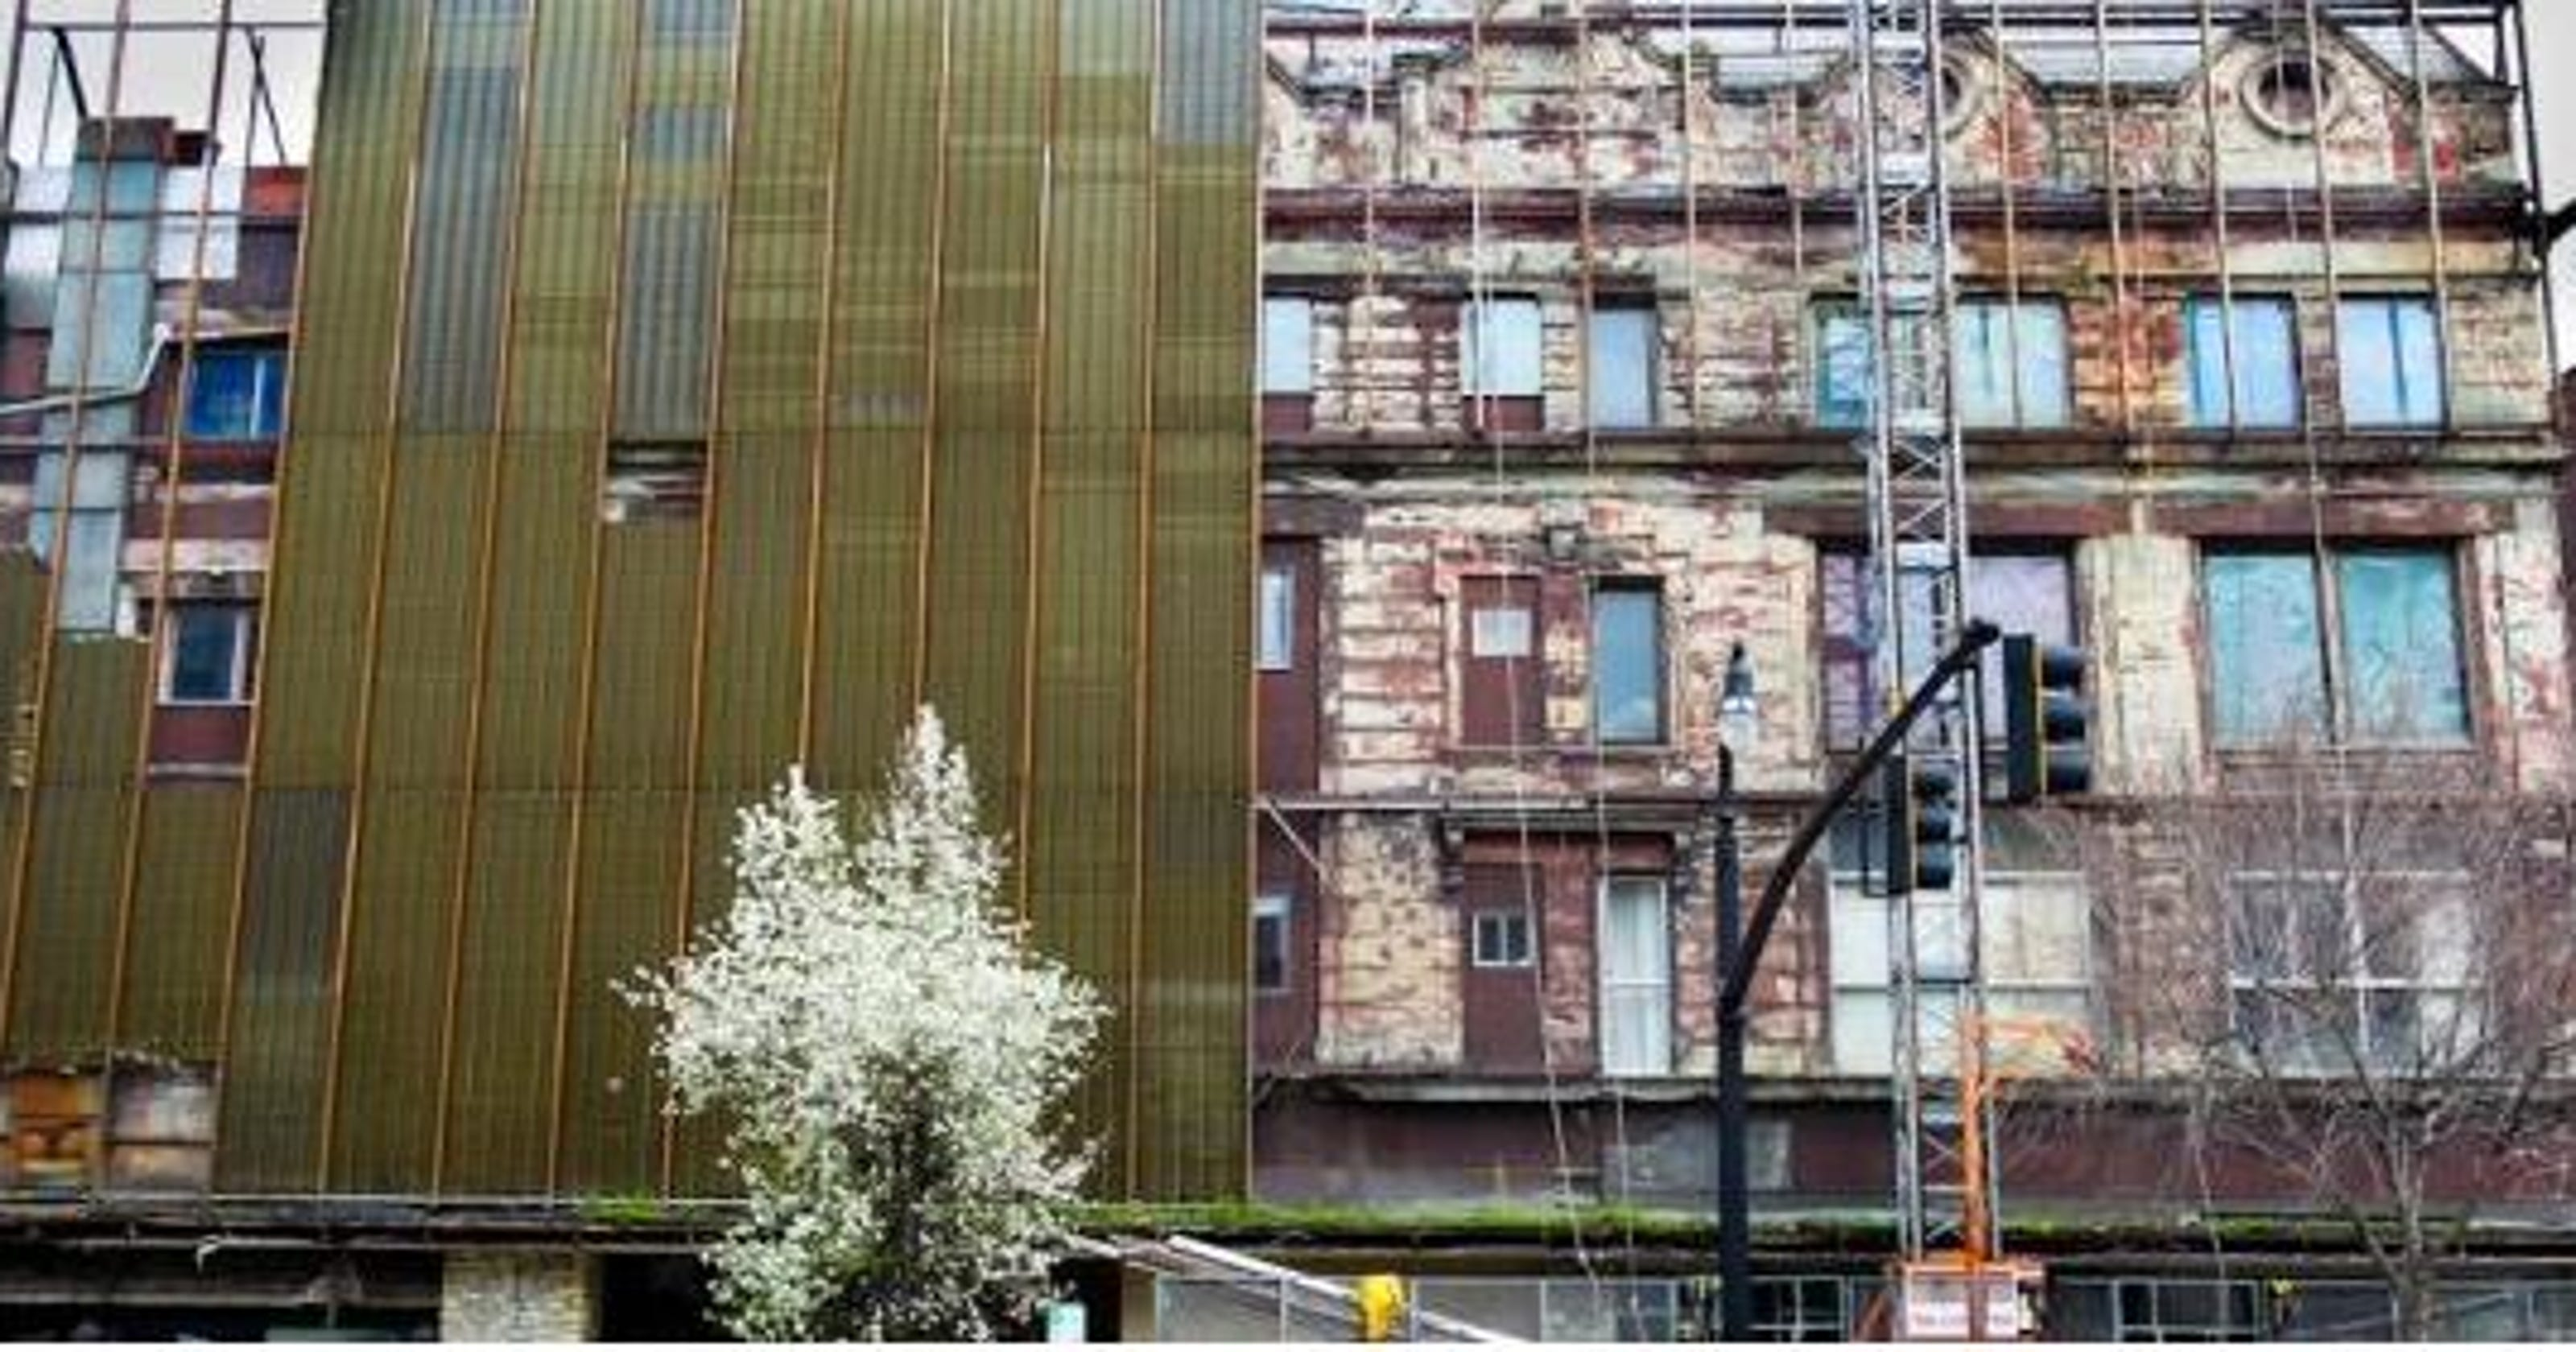 Groundbreaking planned for Artspace lofts